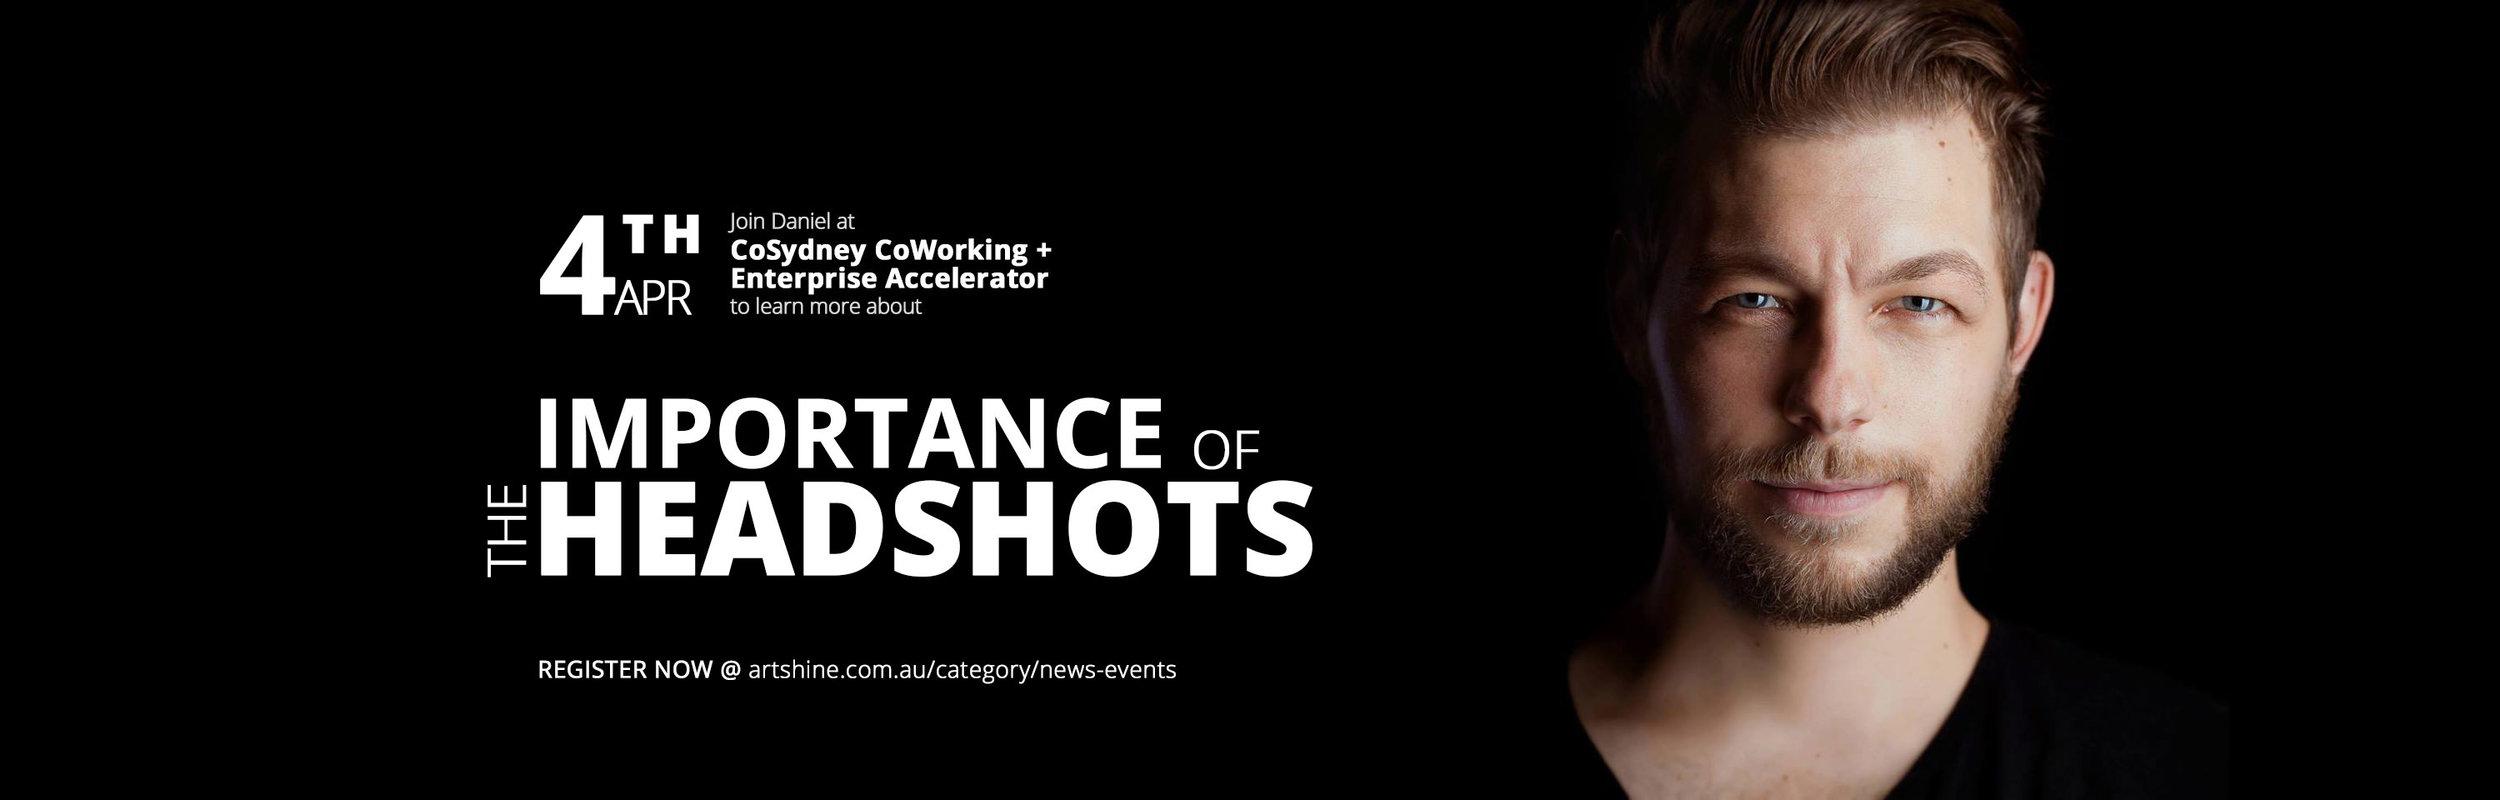 Importance of Headshots Daniel Sommer